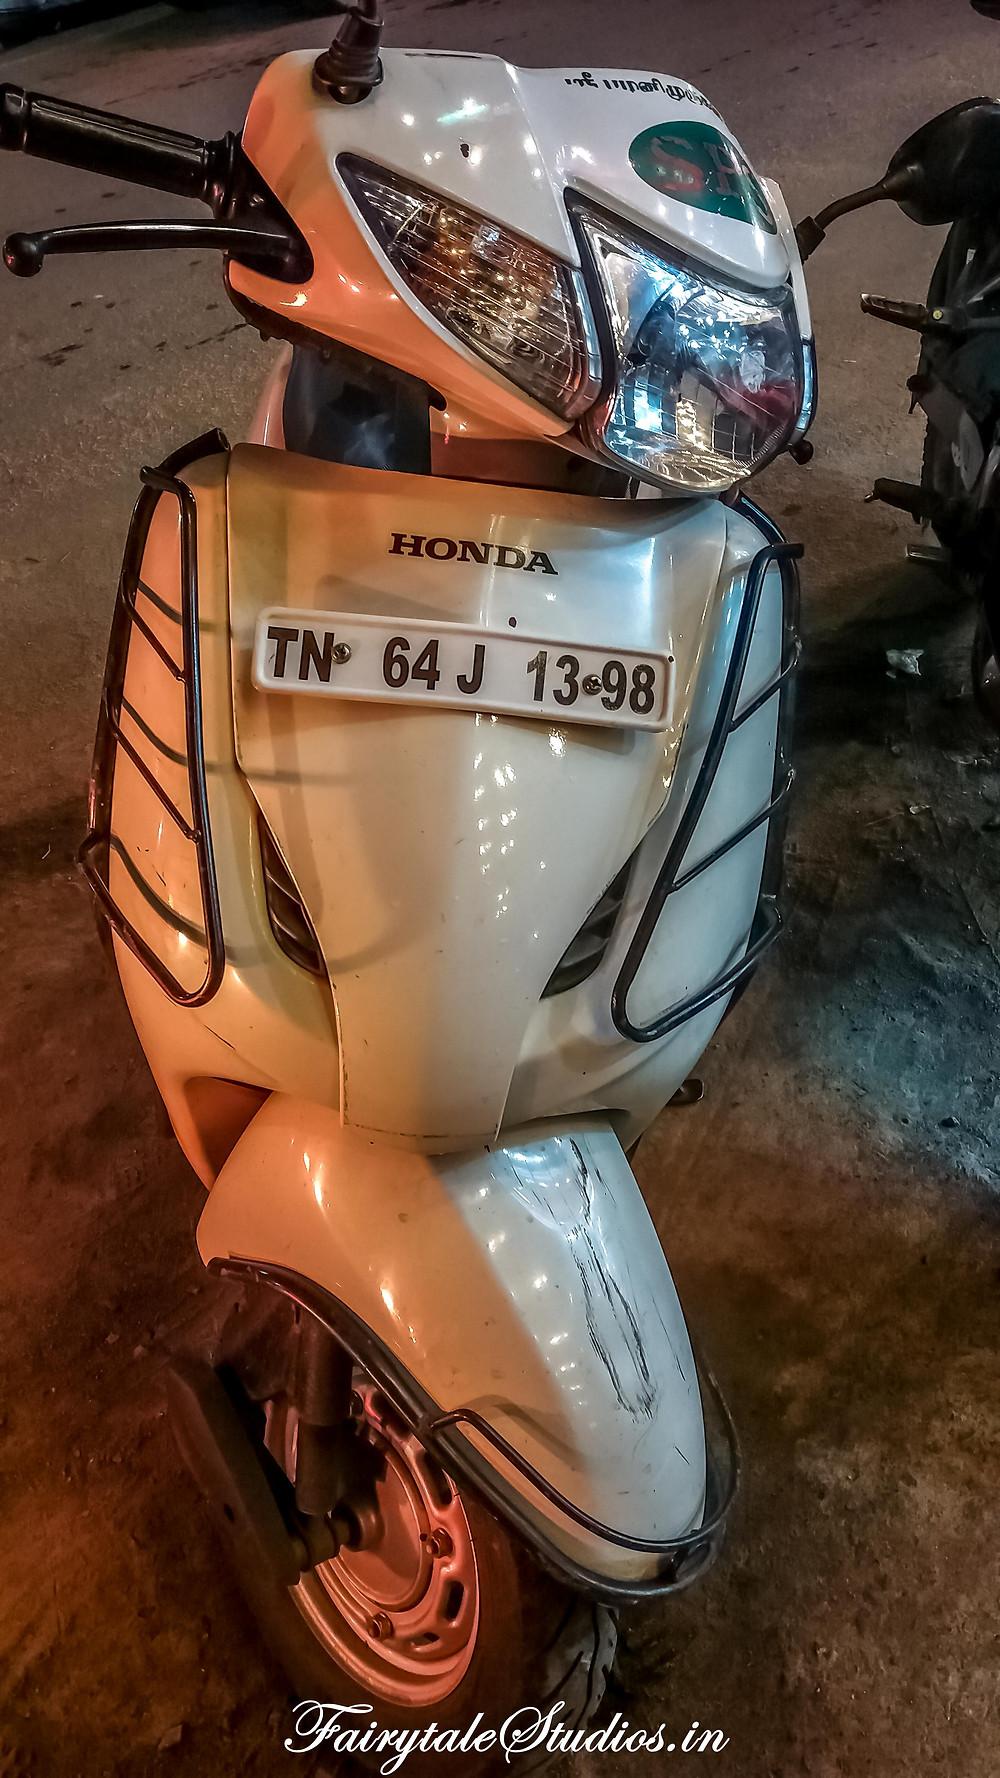 Though options are few, you can hire 2 wheelers in Kodaikanal